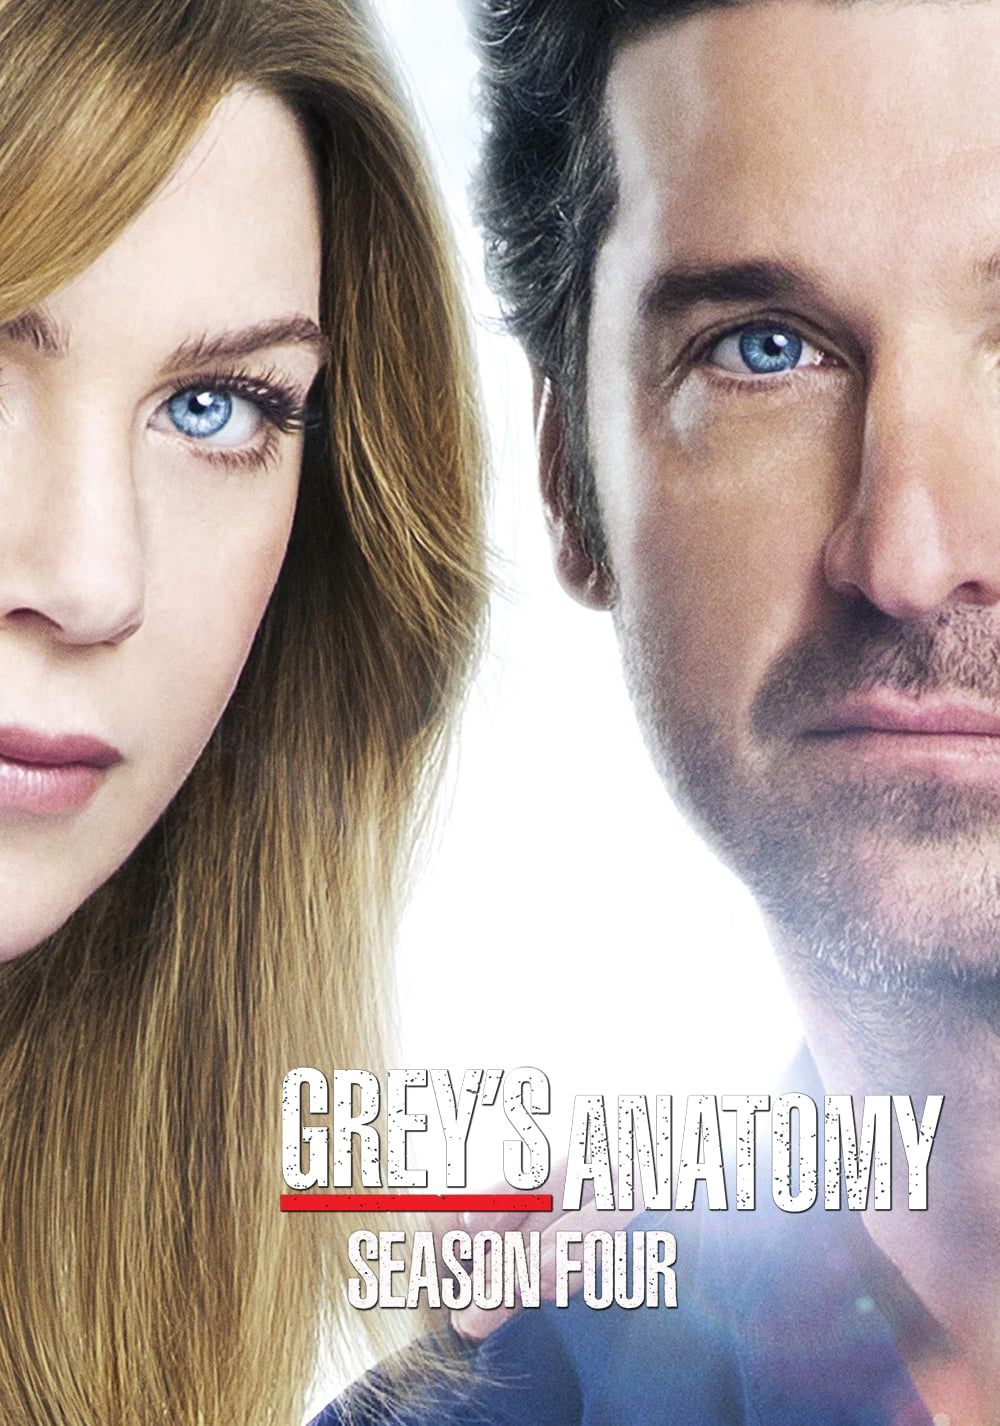 15 Temporada De Grey's Anatomy Assistir grey's anatomy temporada 4 - adorocinema